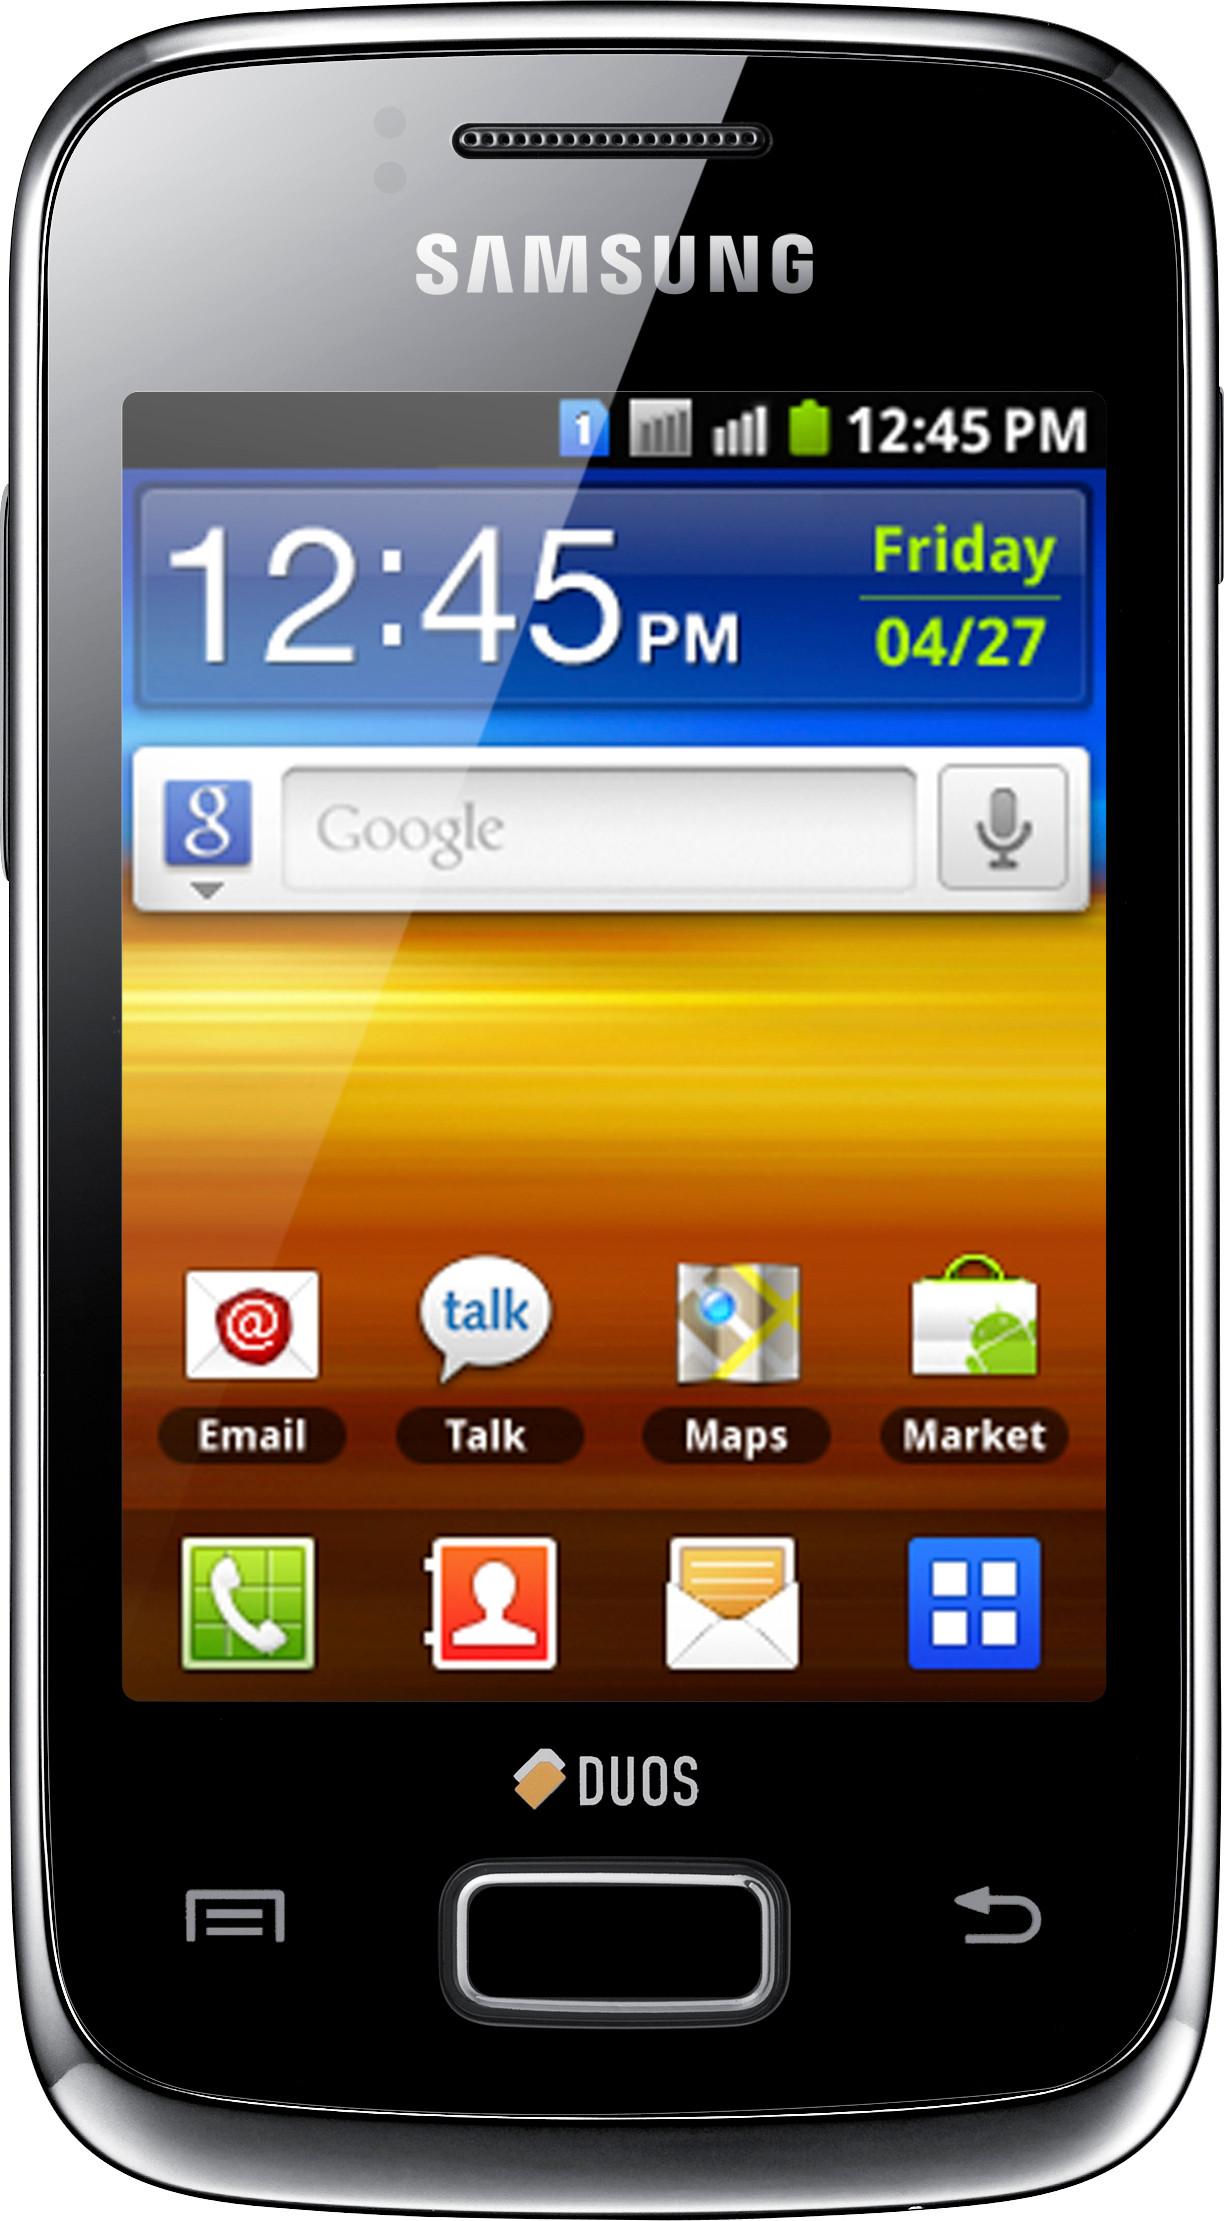 Samsung Galaxy Y Duos (384MB RAM, 512MB)